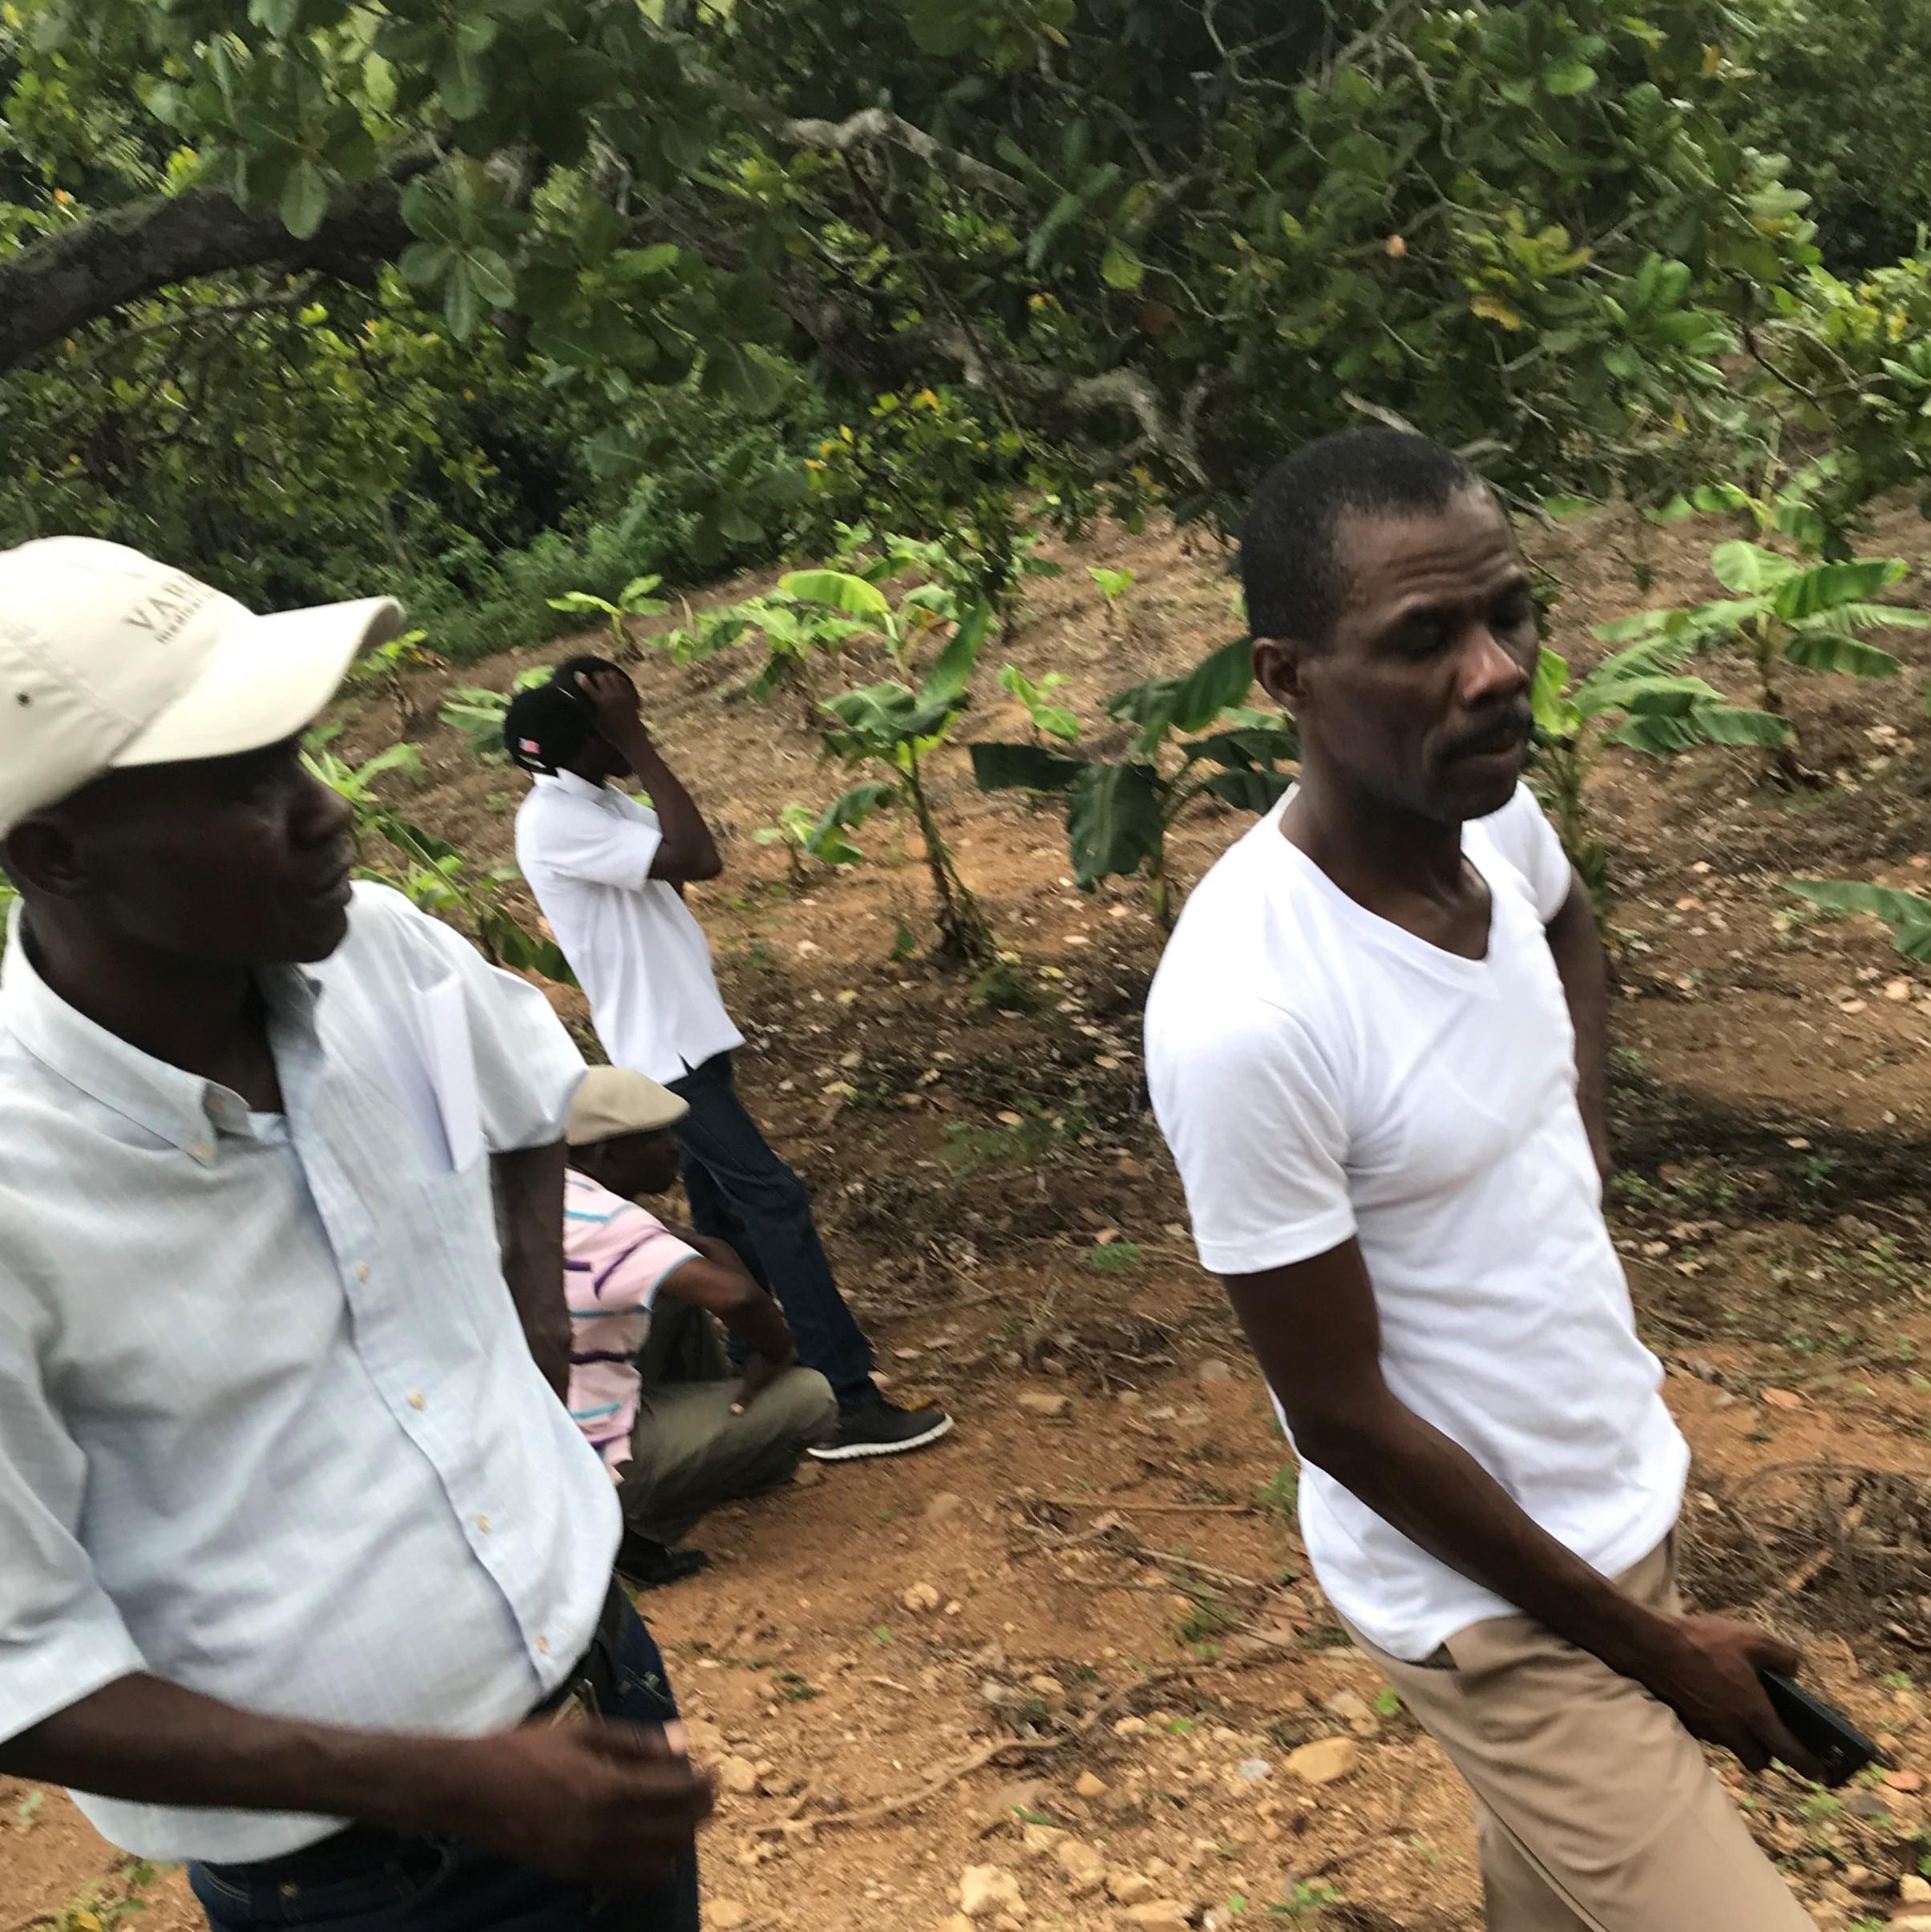 OPODNE Models A Cooperative Economy For Haiti